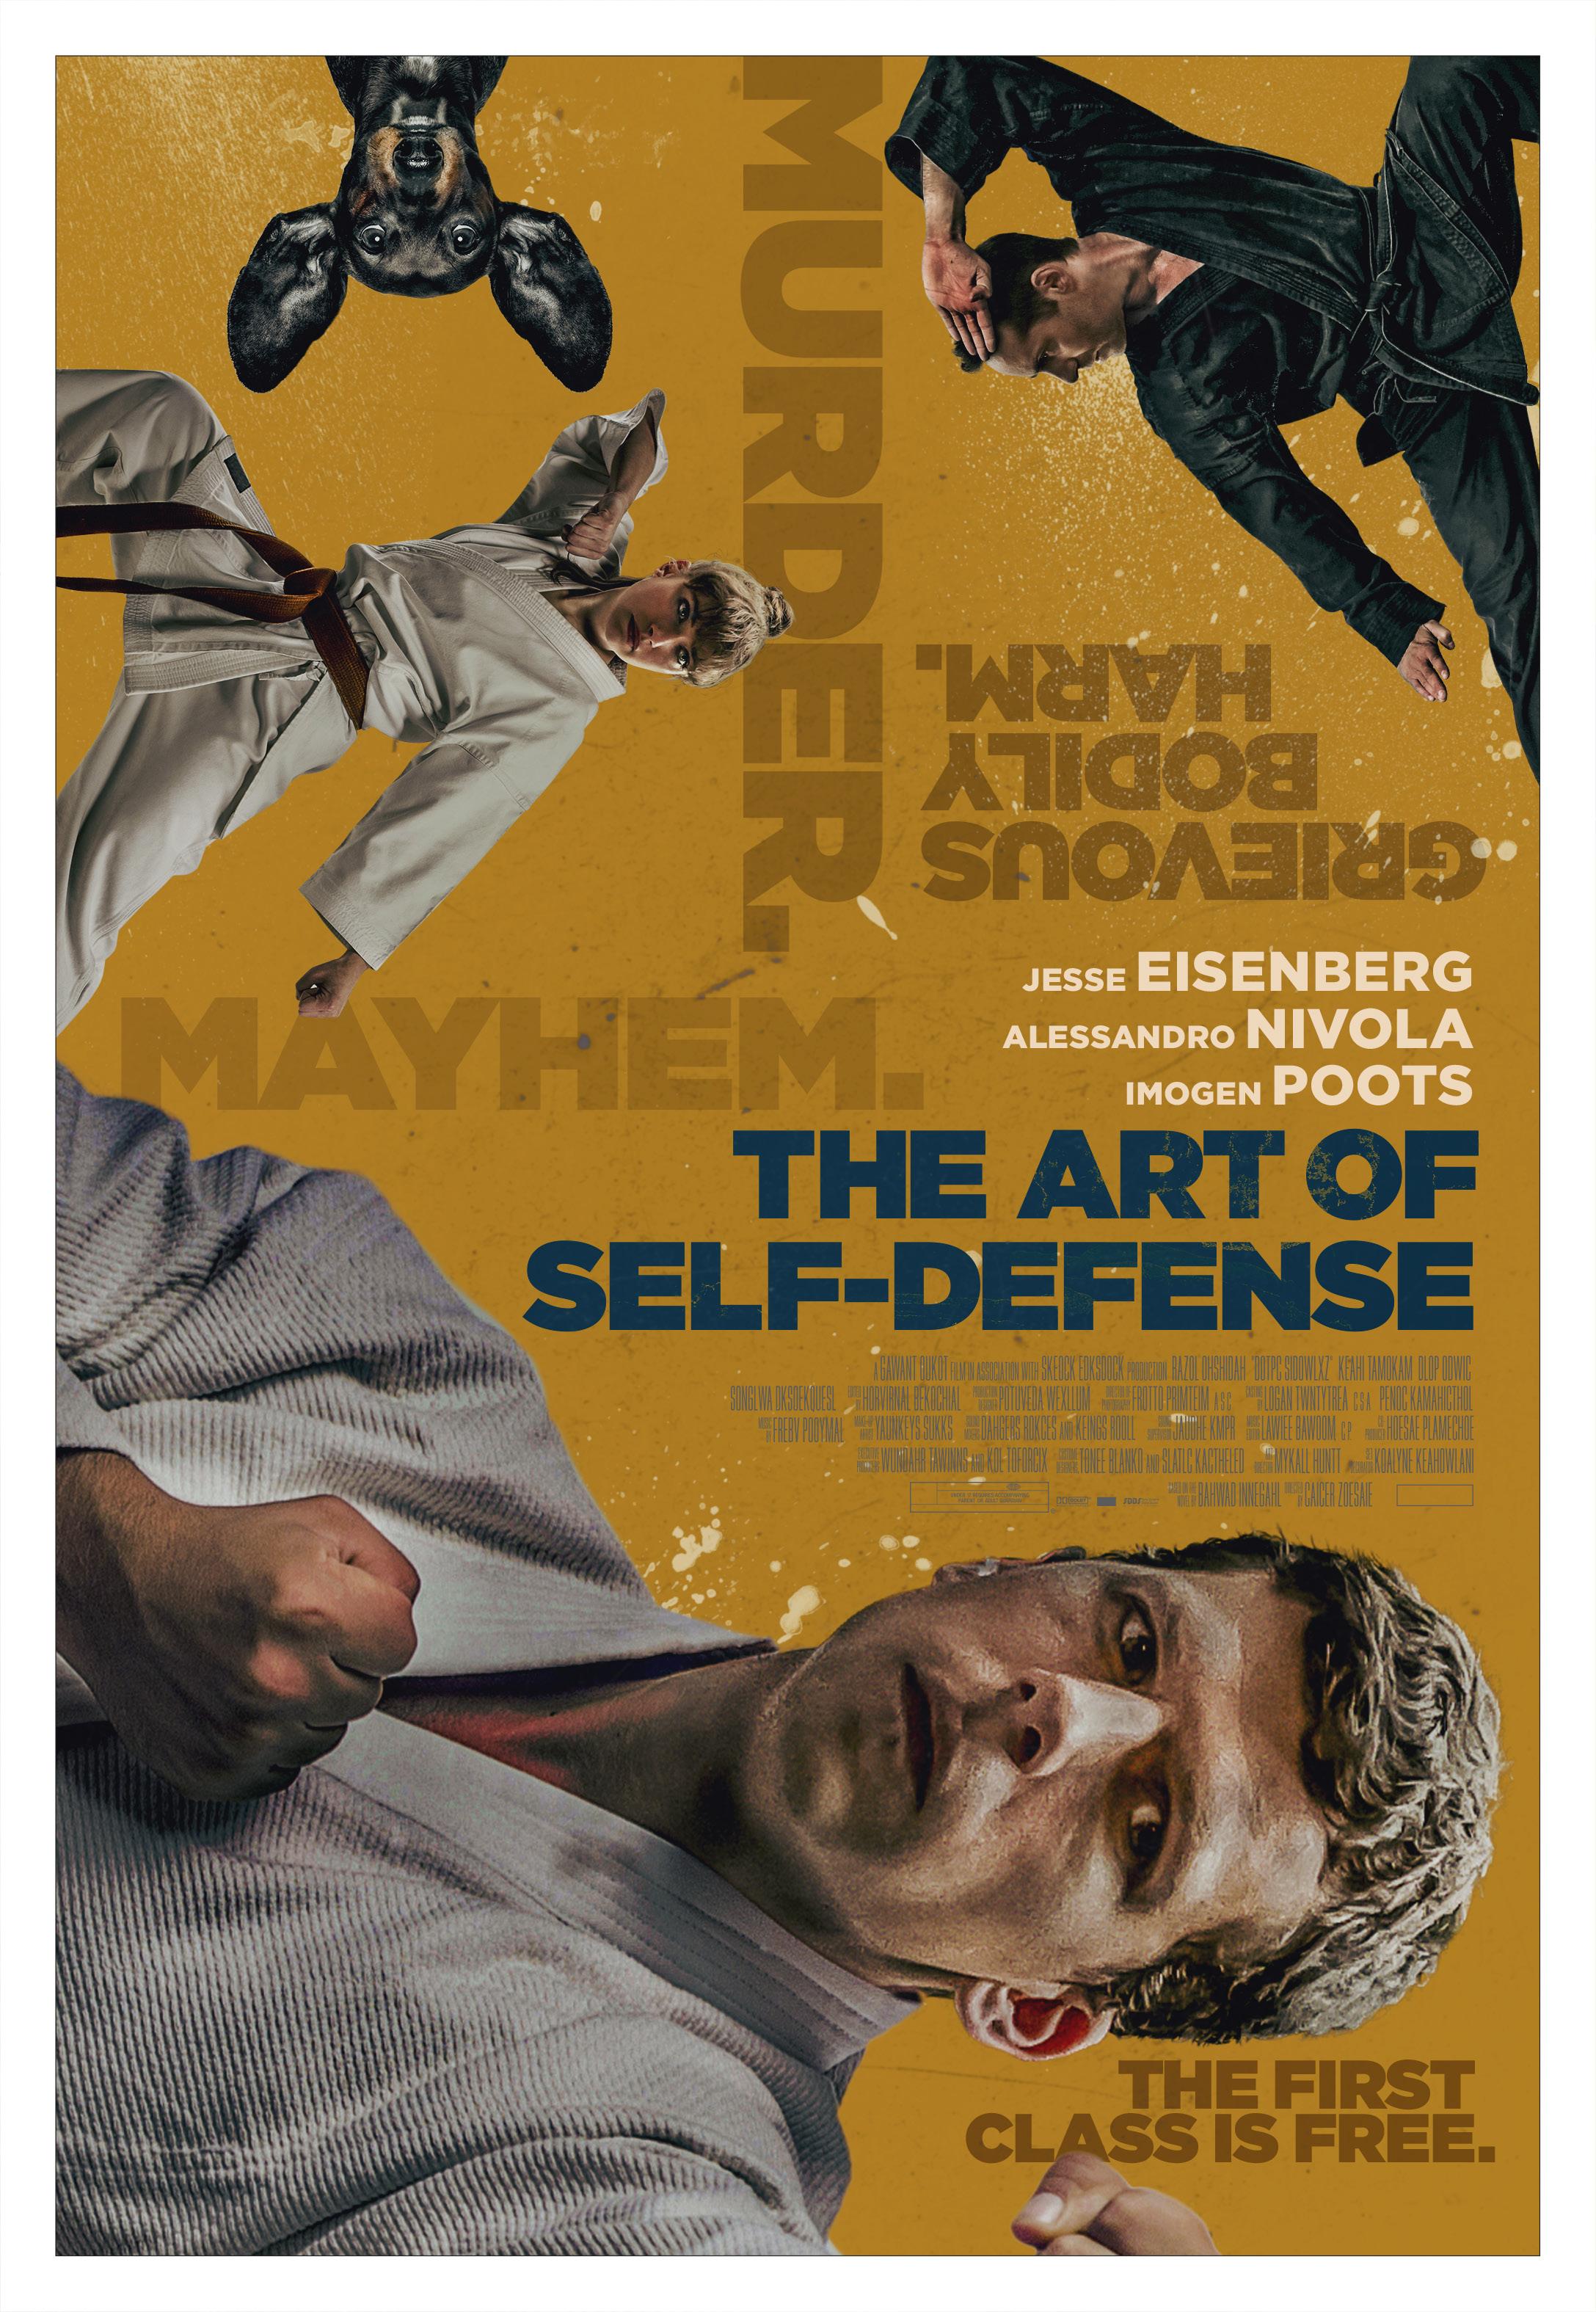 TheArtofSelfDefense_poster.jpg